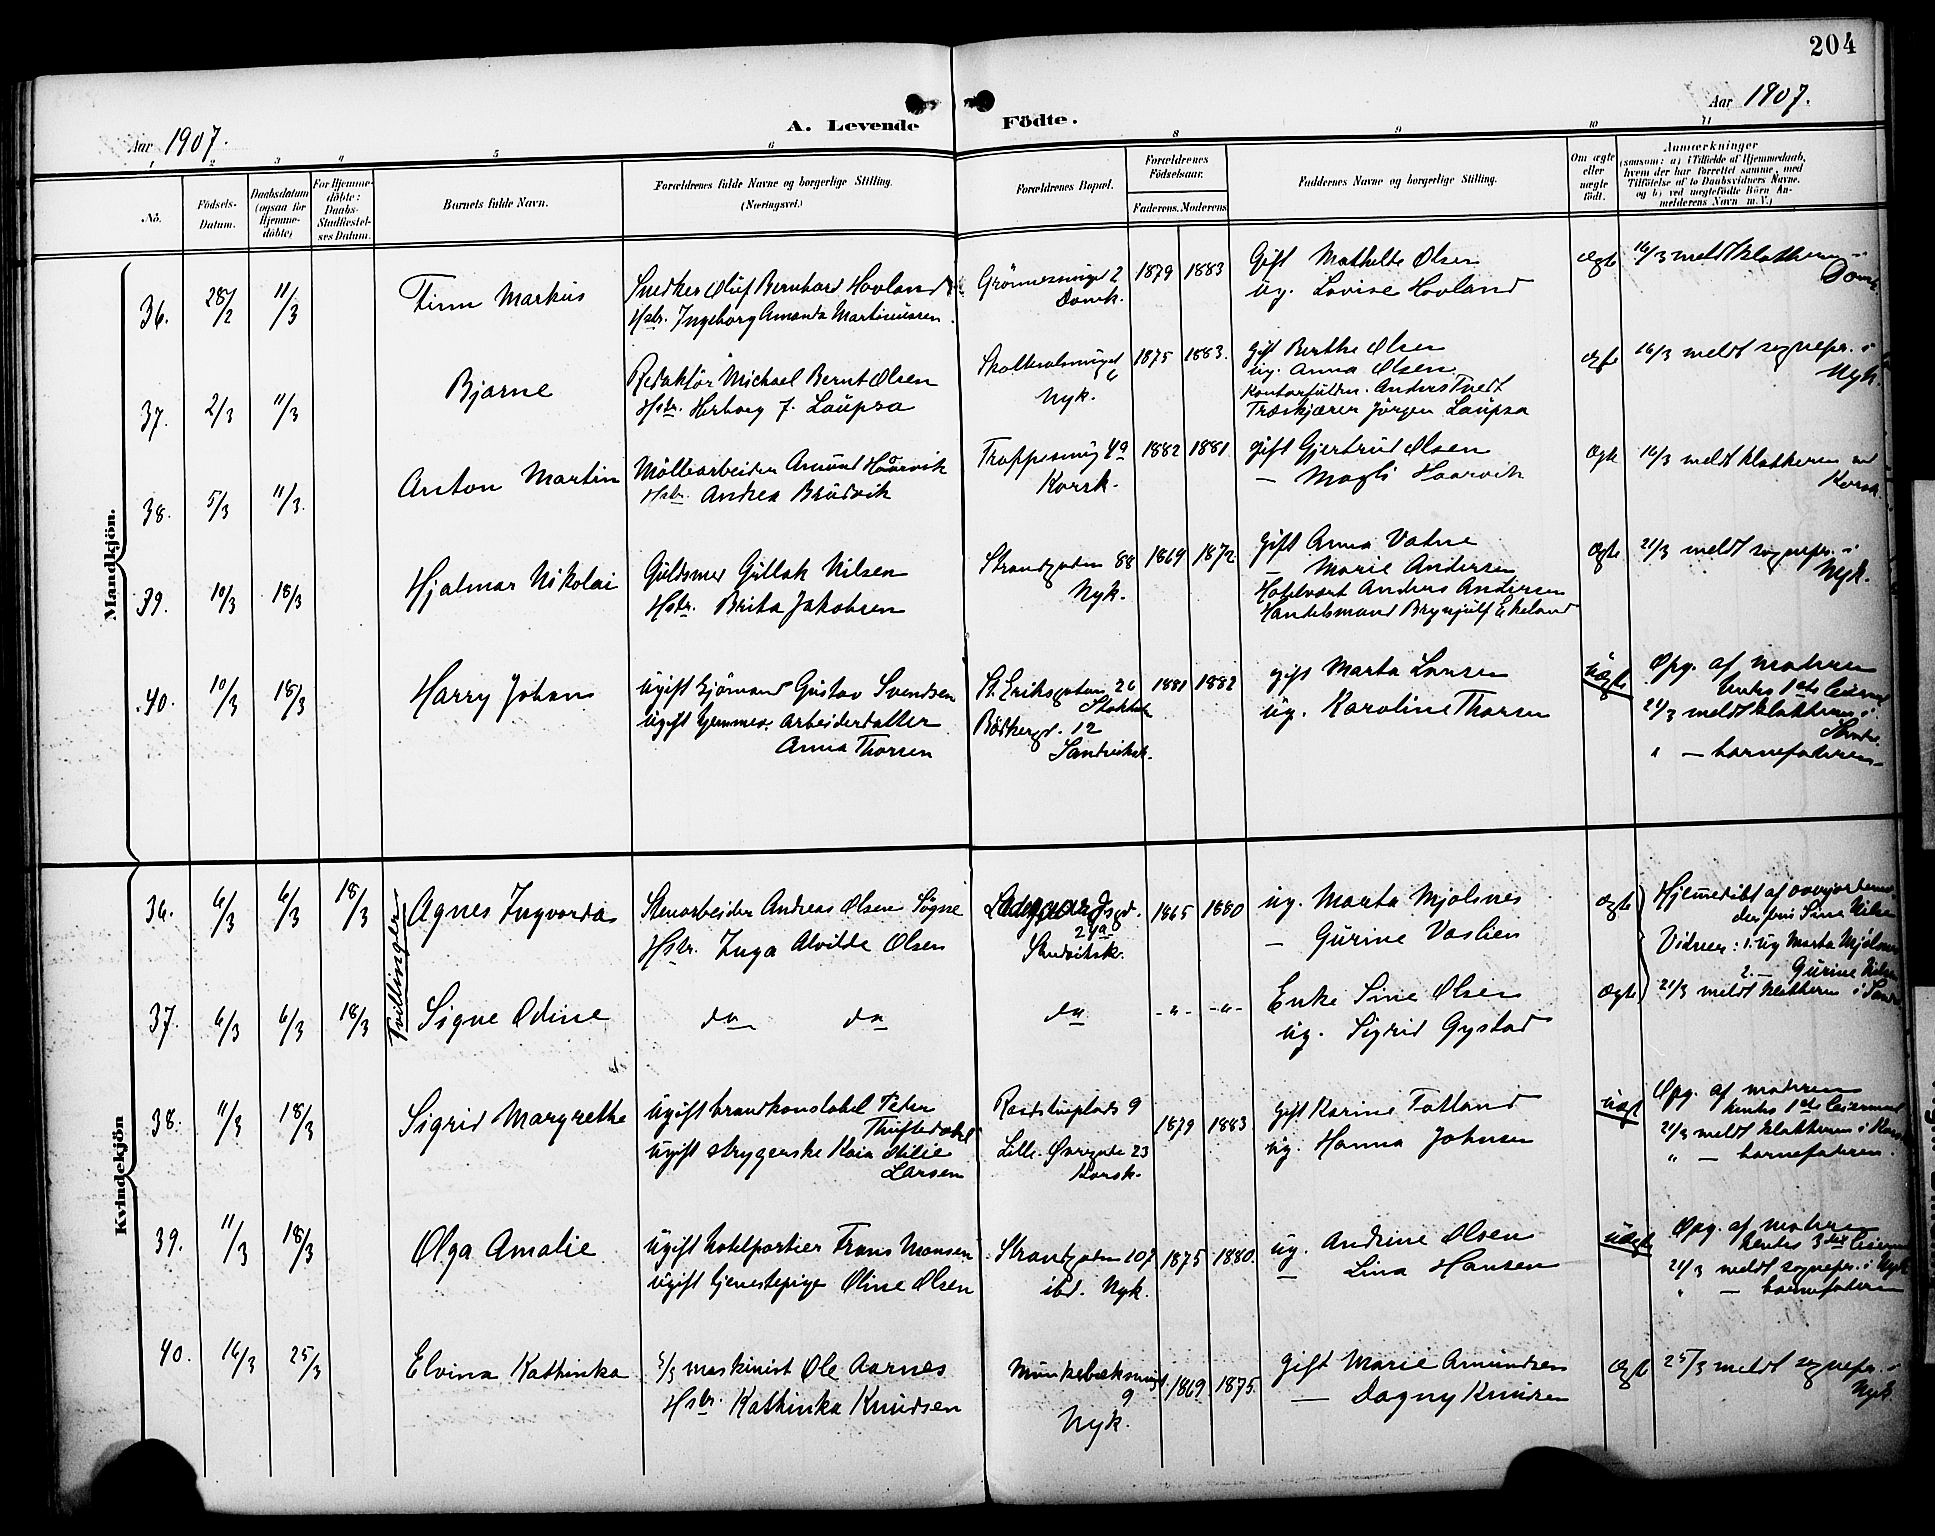 SAB, Fødselsstiftelsens sokneprestembete*, Ministerialbok nr. A 3, 1901-1910, s. 204